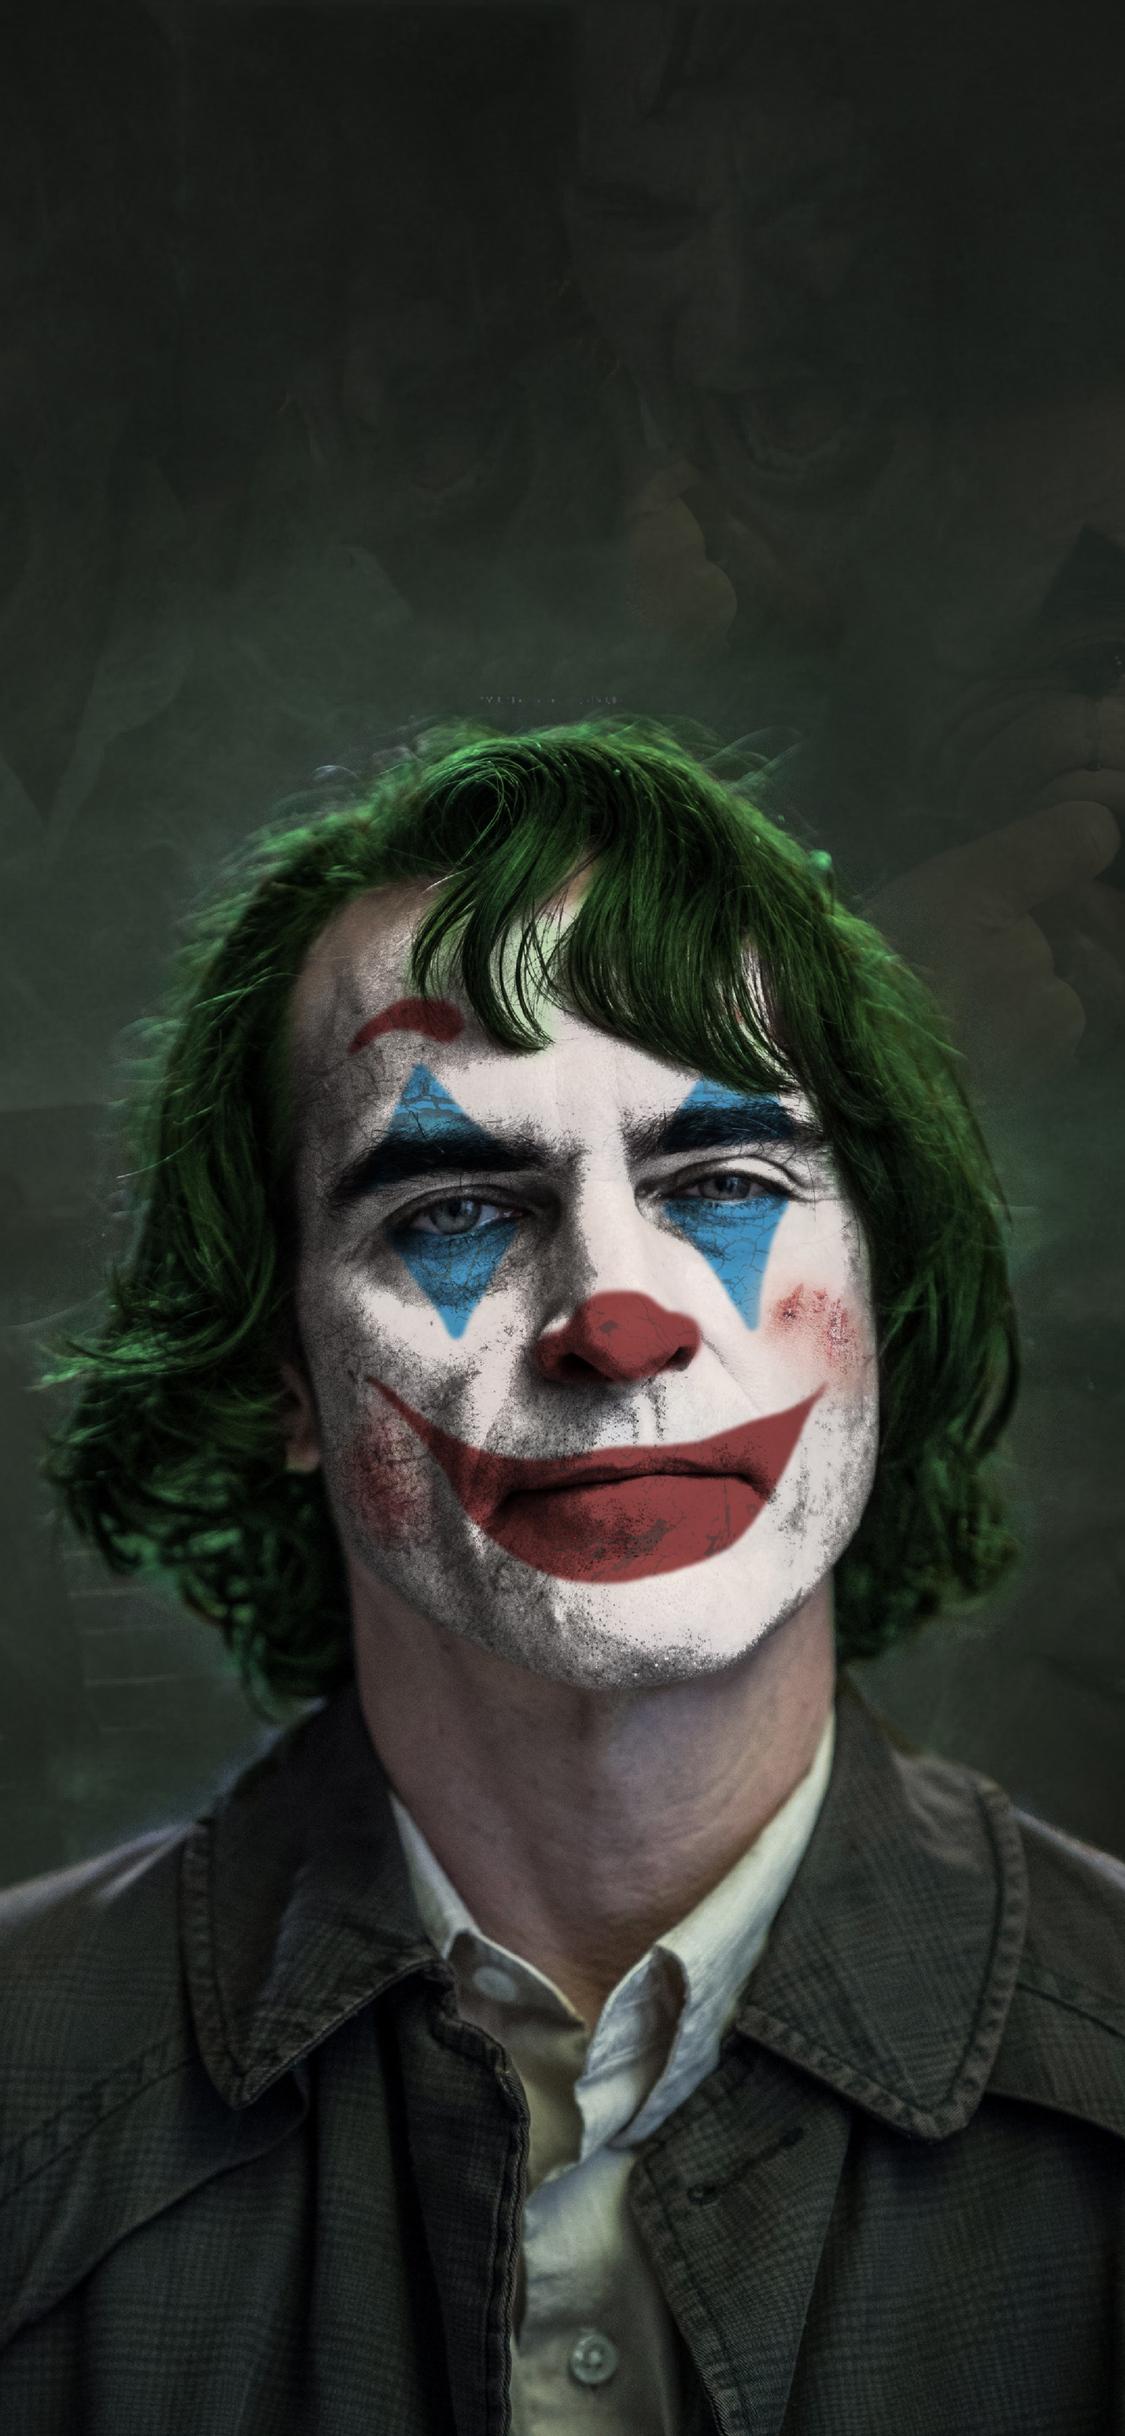 1125x2436 Joker Joaquin Phoenix Movie Art Iphone Xs Iphone